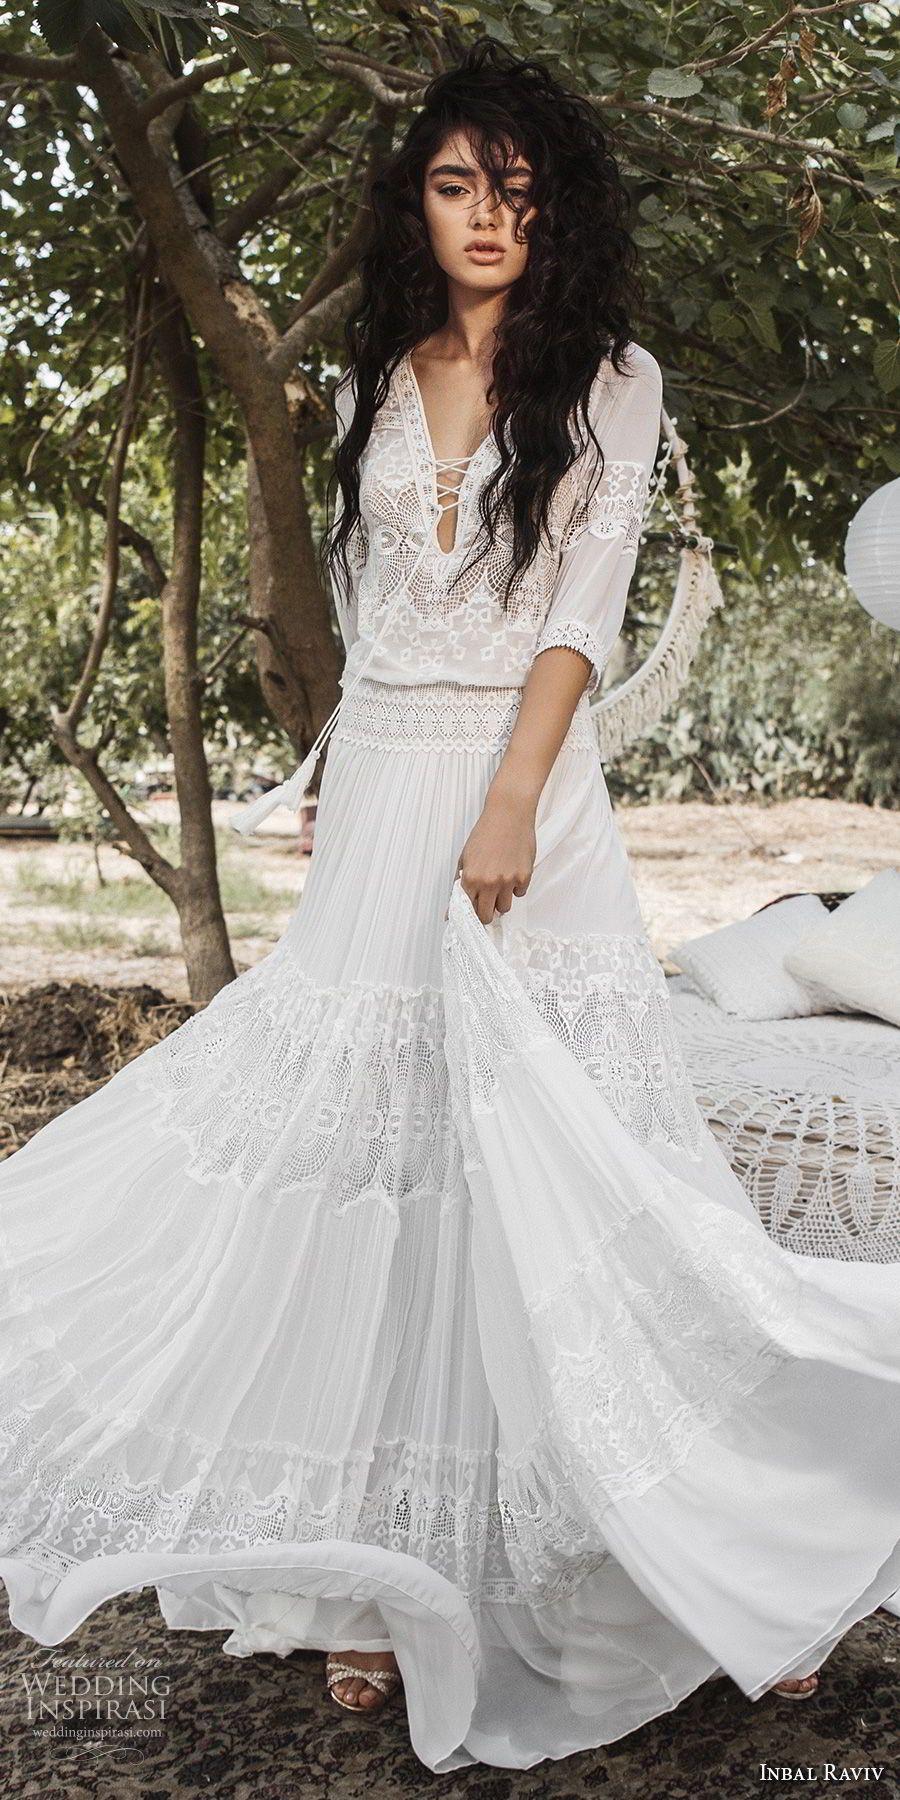 Boho wedding dress with sleeves  Inbal Raviv  Wedding Dresses  Wedding  Pinterest  Bodice